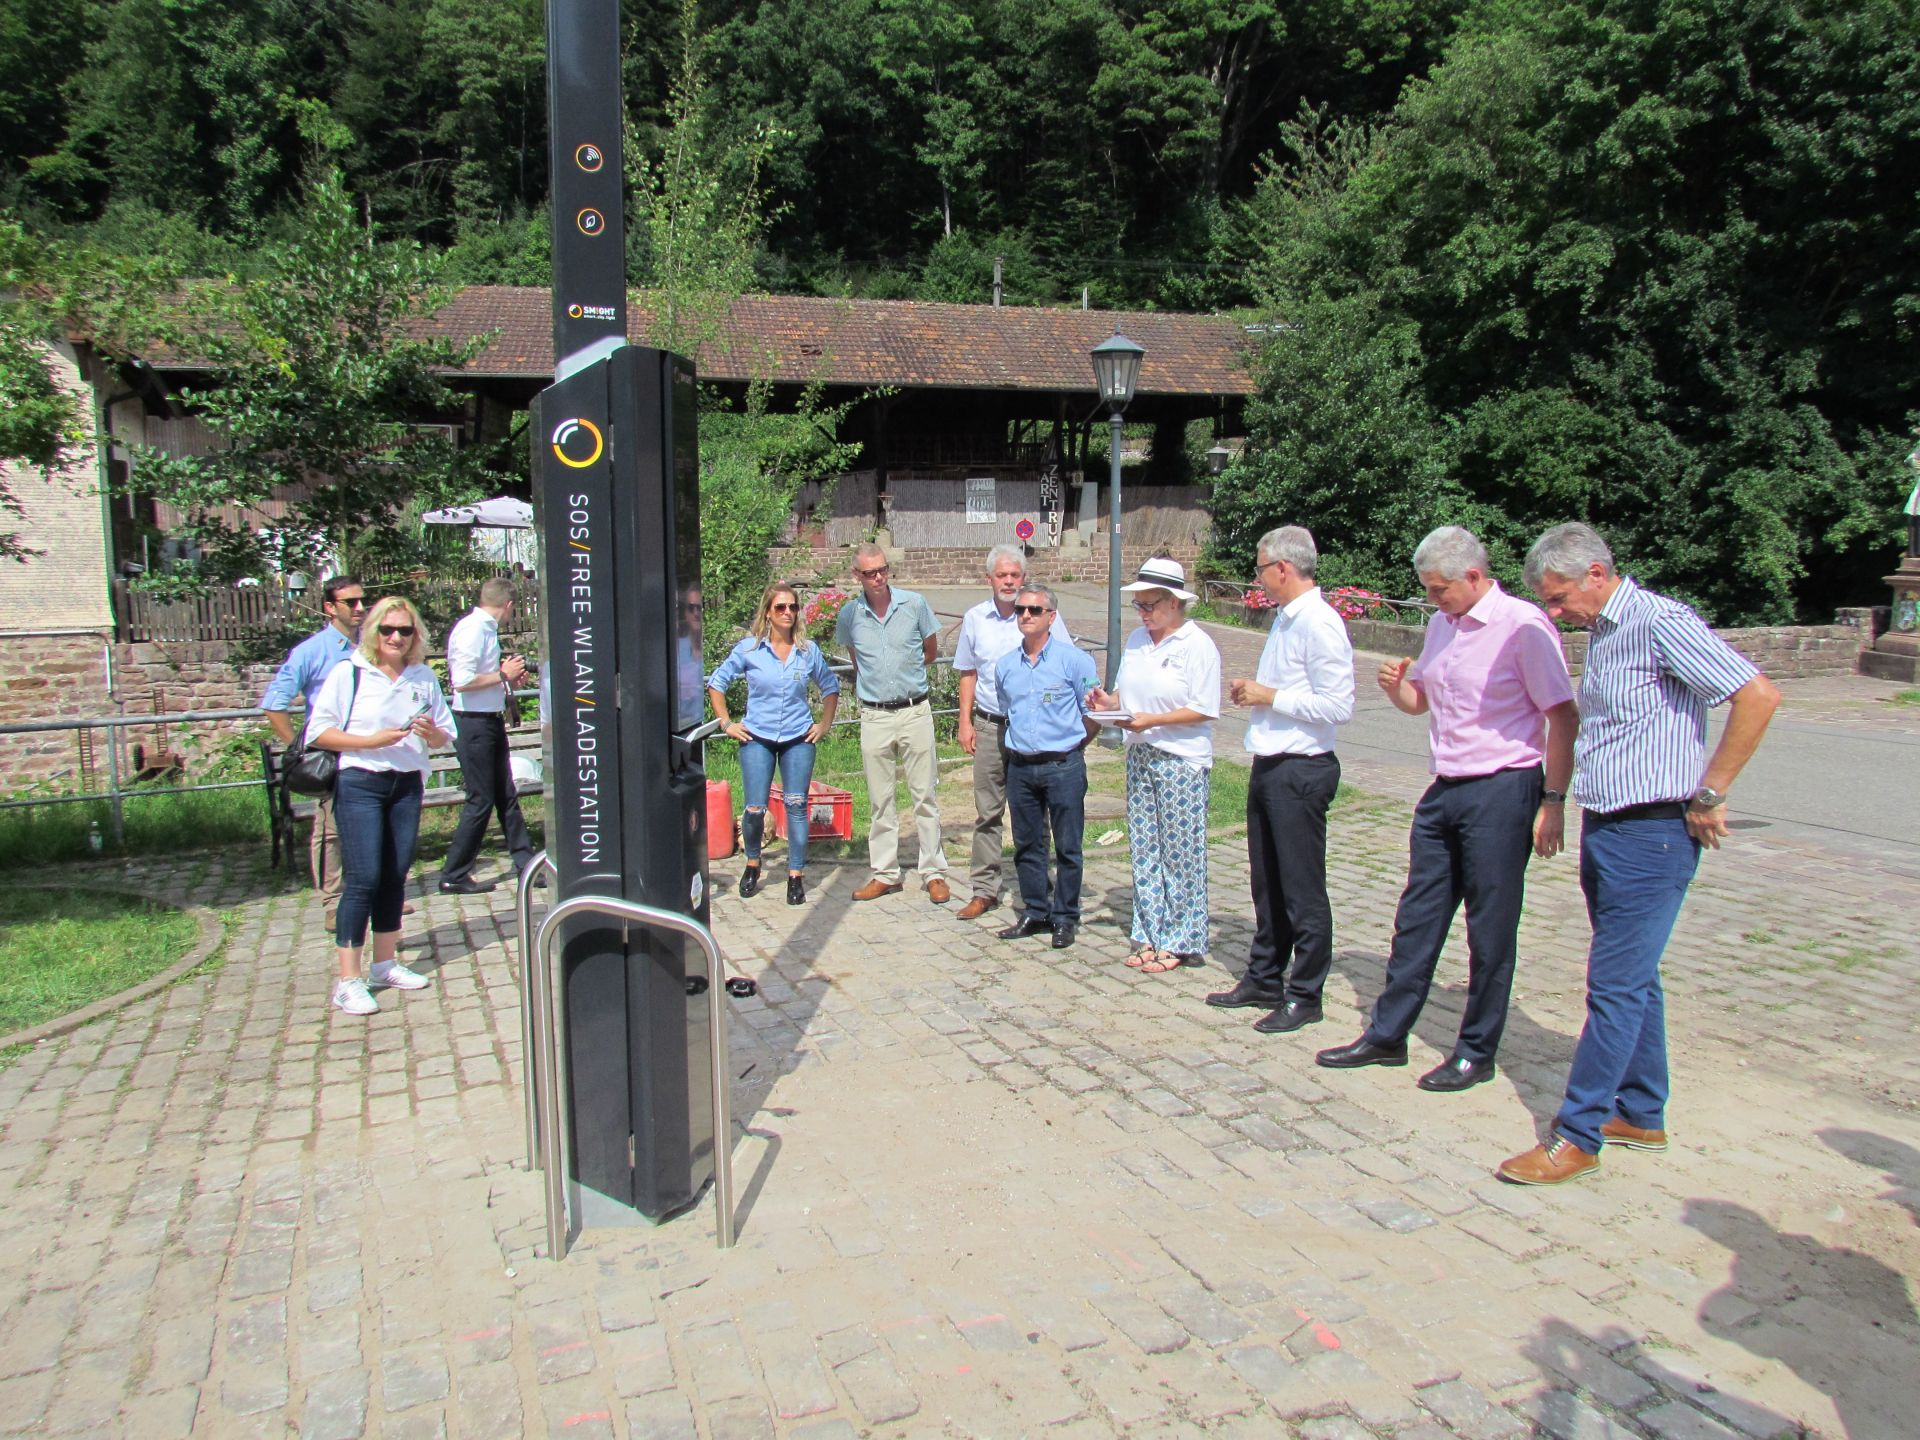 Brusque será a primeira cidade do Continente Americano a receber os postes inteligentes da Alemanha